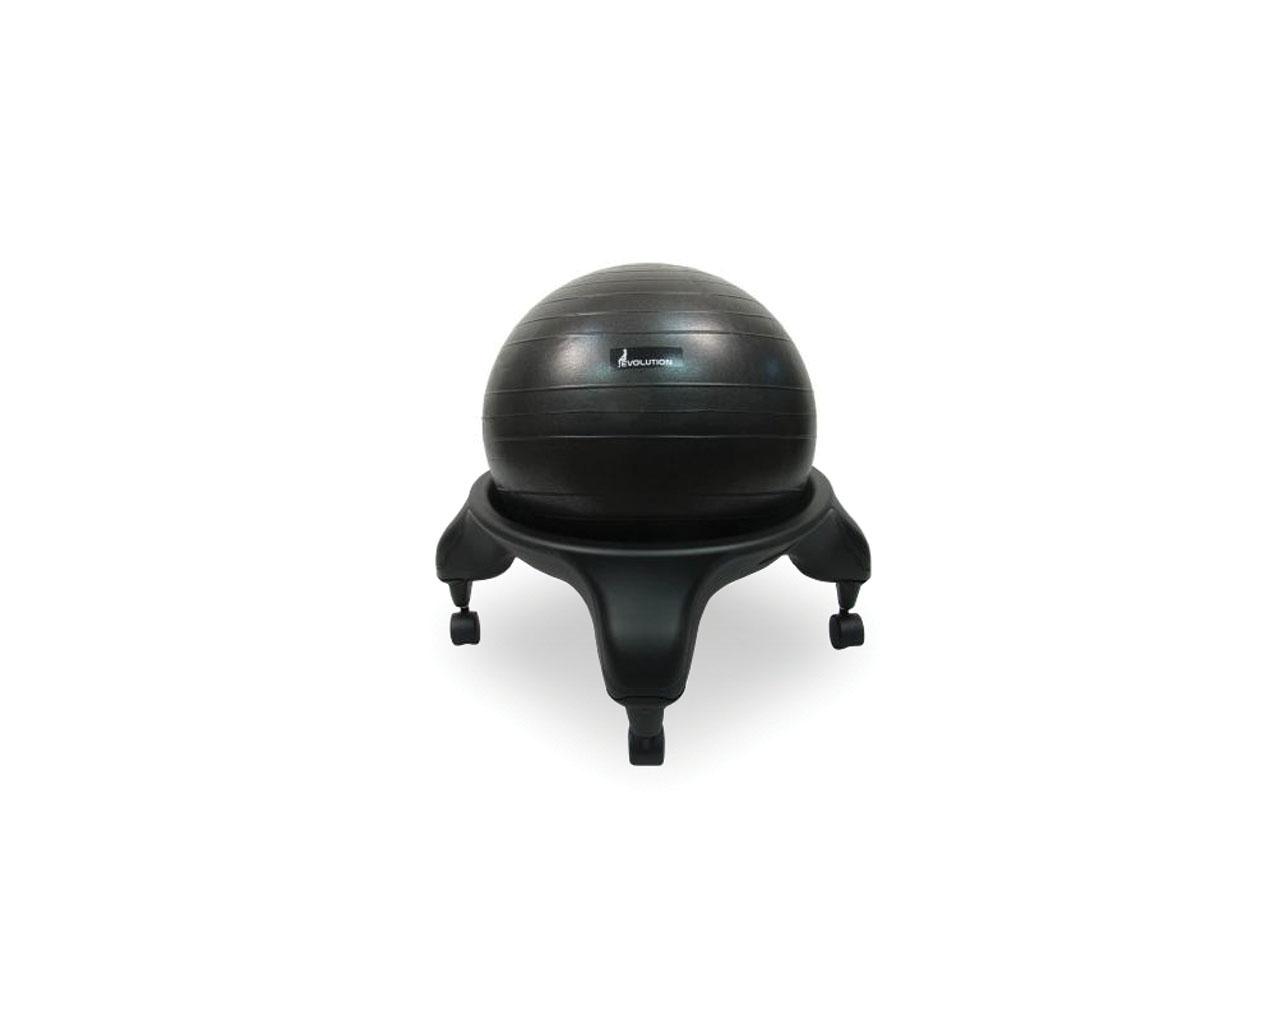 ergonomic chair là gì wood rocking chairs outdoor evolution ball chair2 jpg